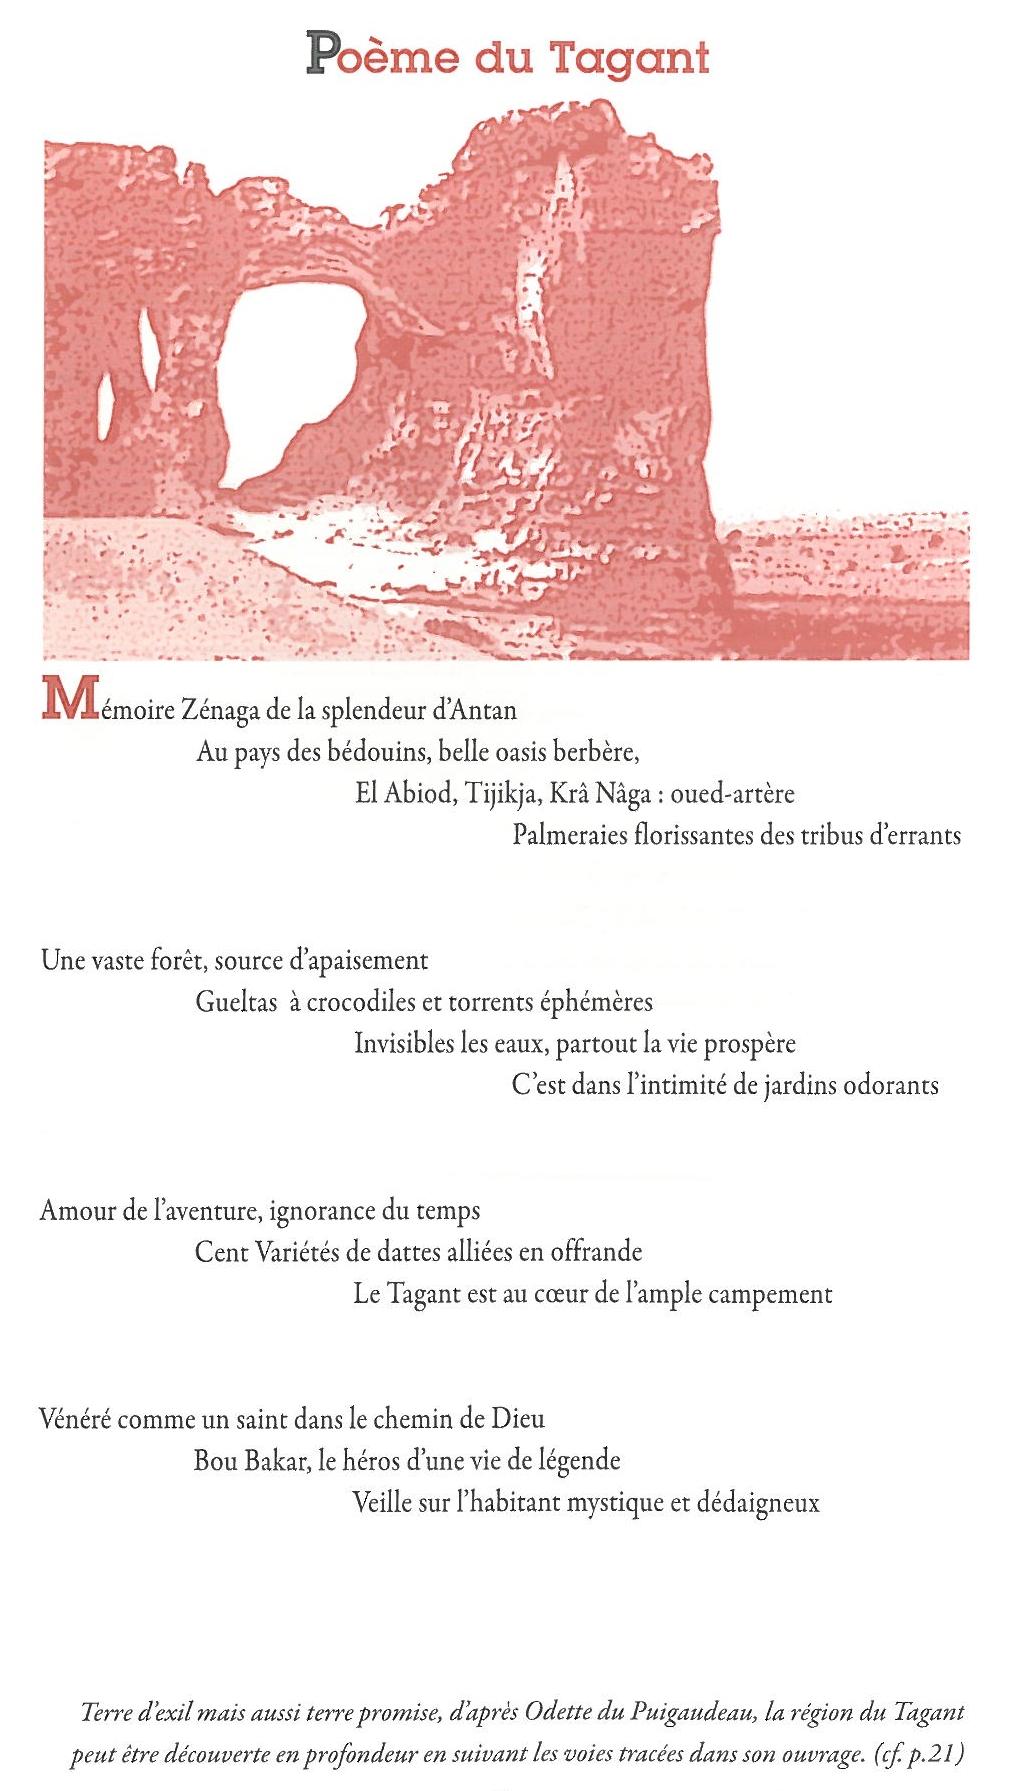 Poème du Tagant